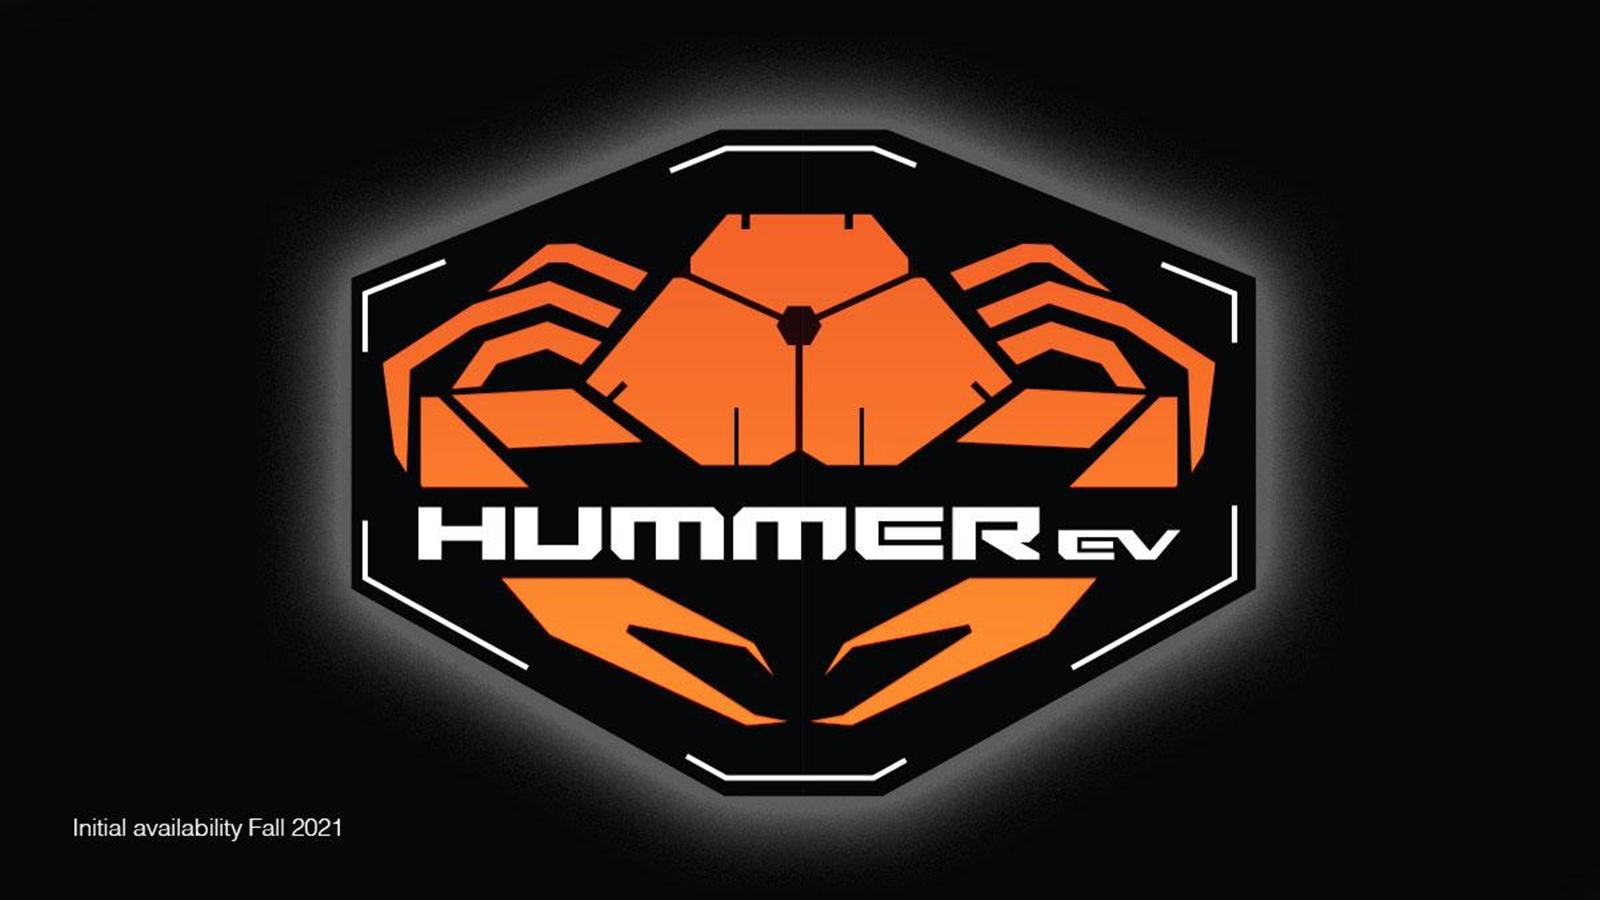 Hummer Ev Logo Cangrejo